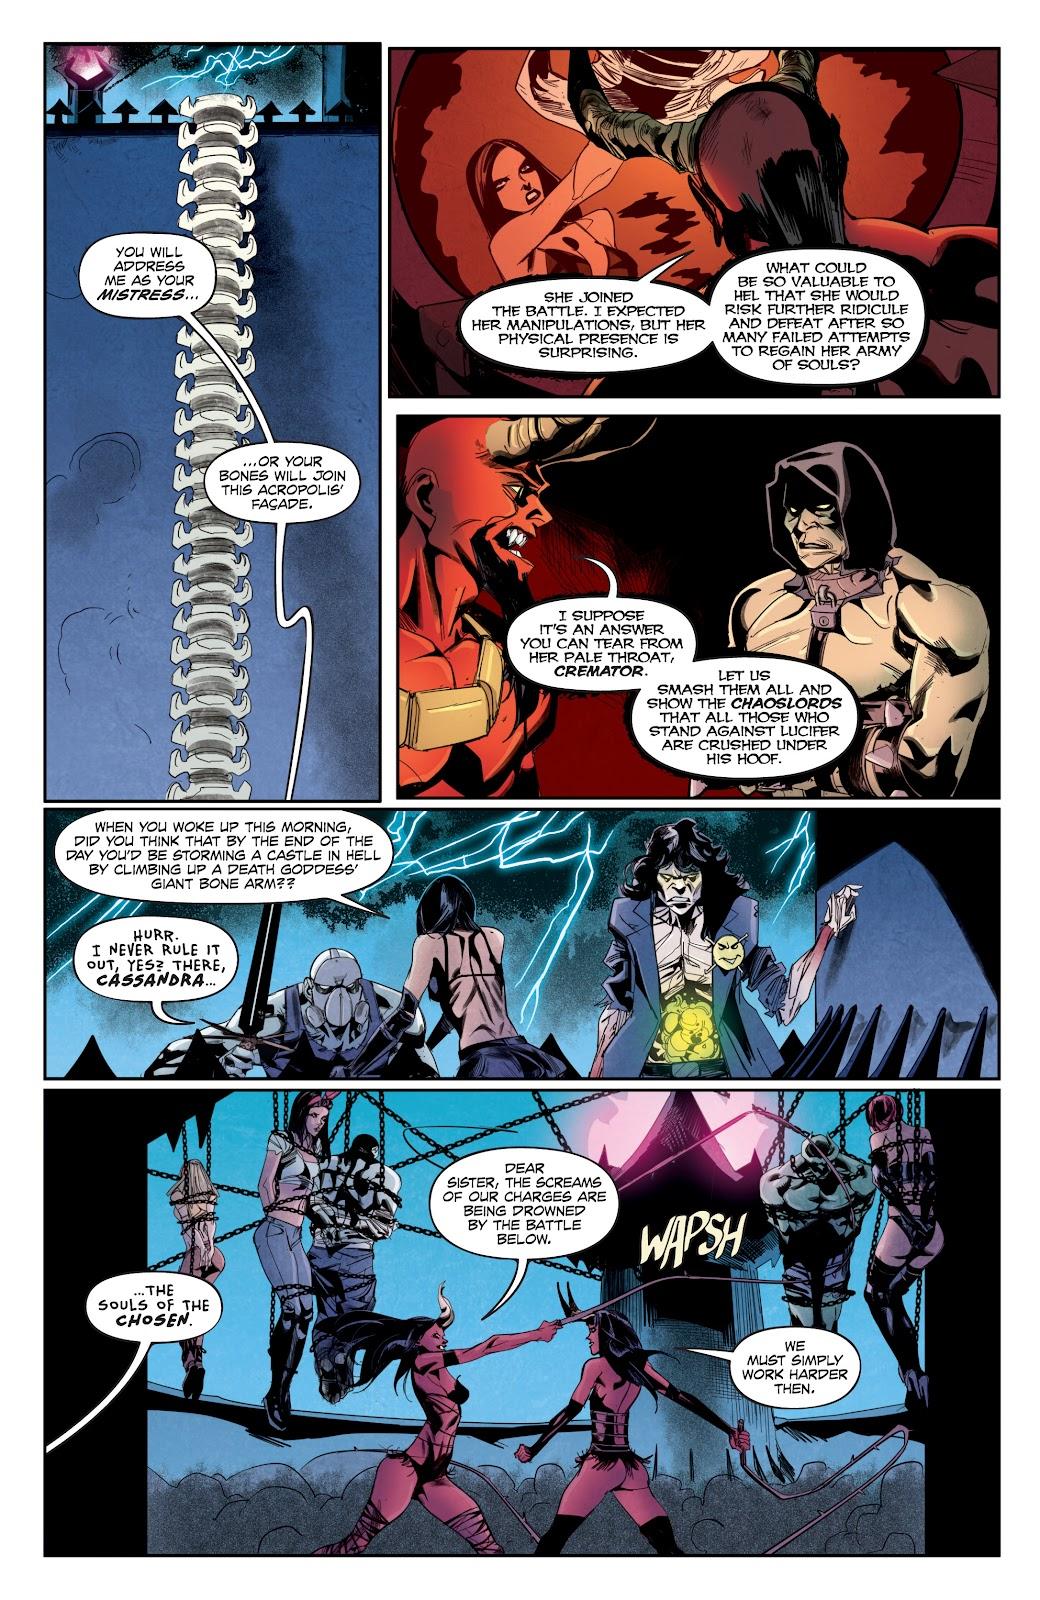 Read online Hack/Slash vs. Chaos comic -  Issue #5 - 8